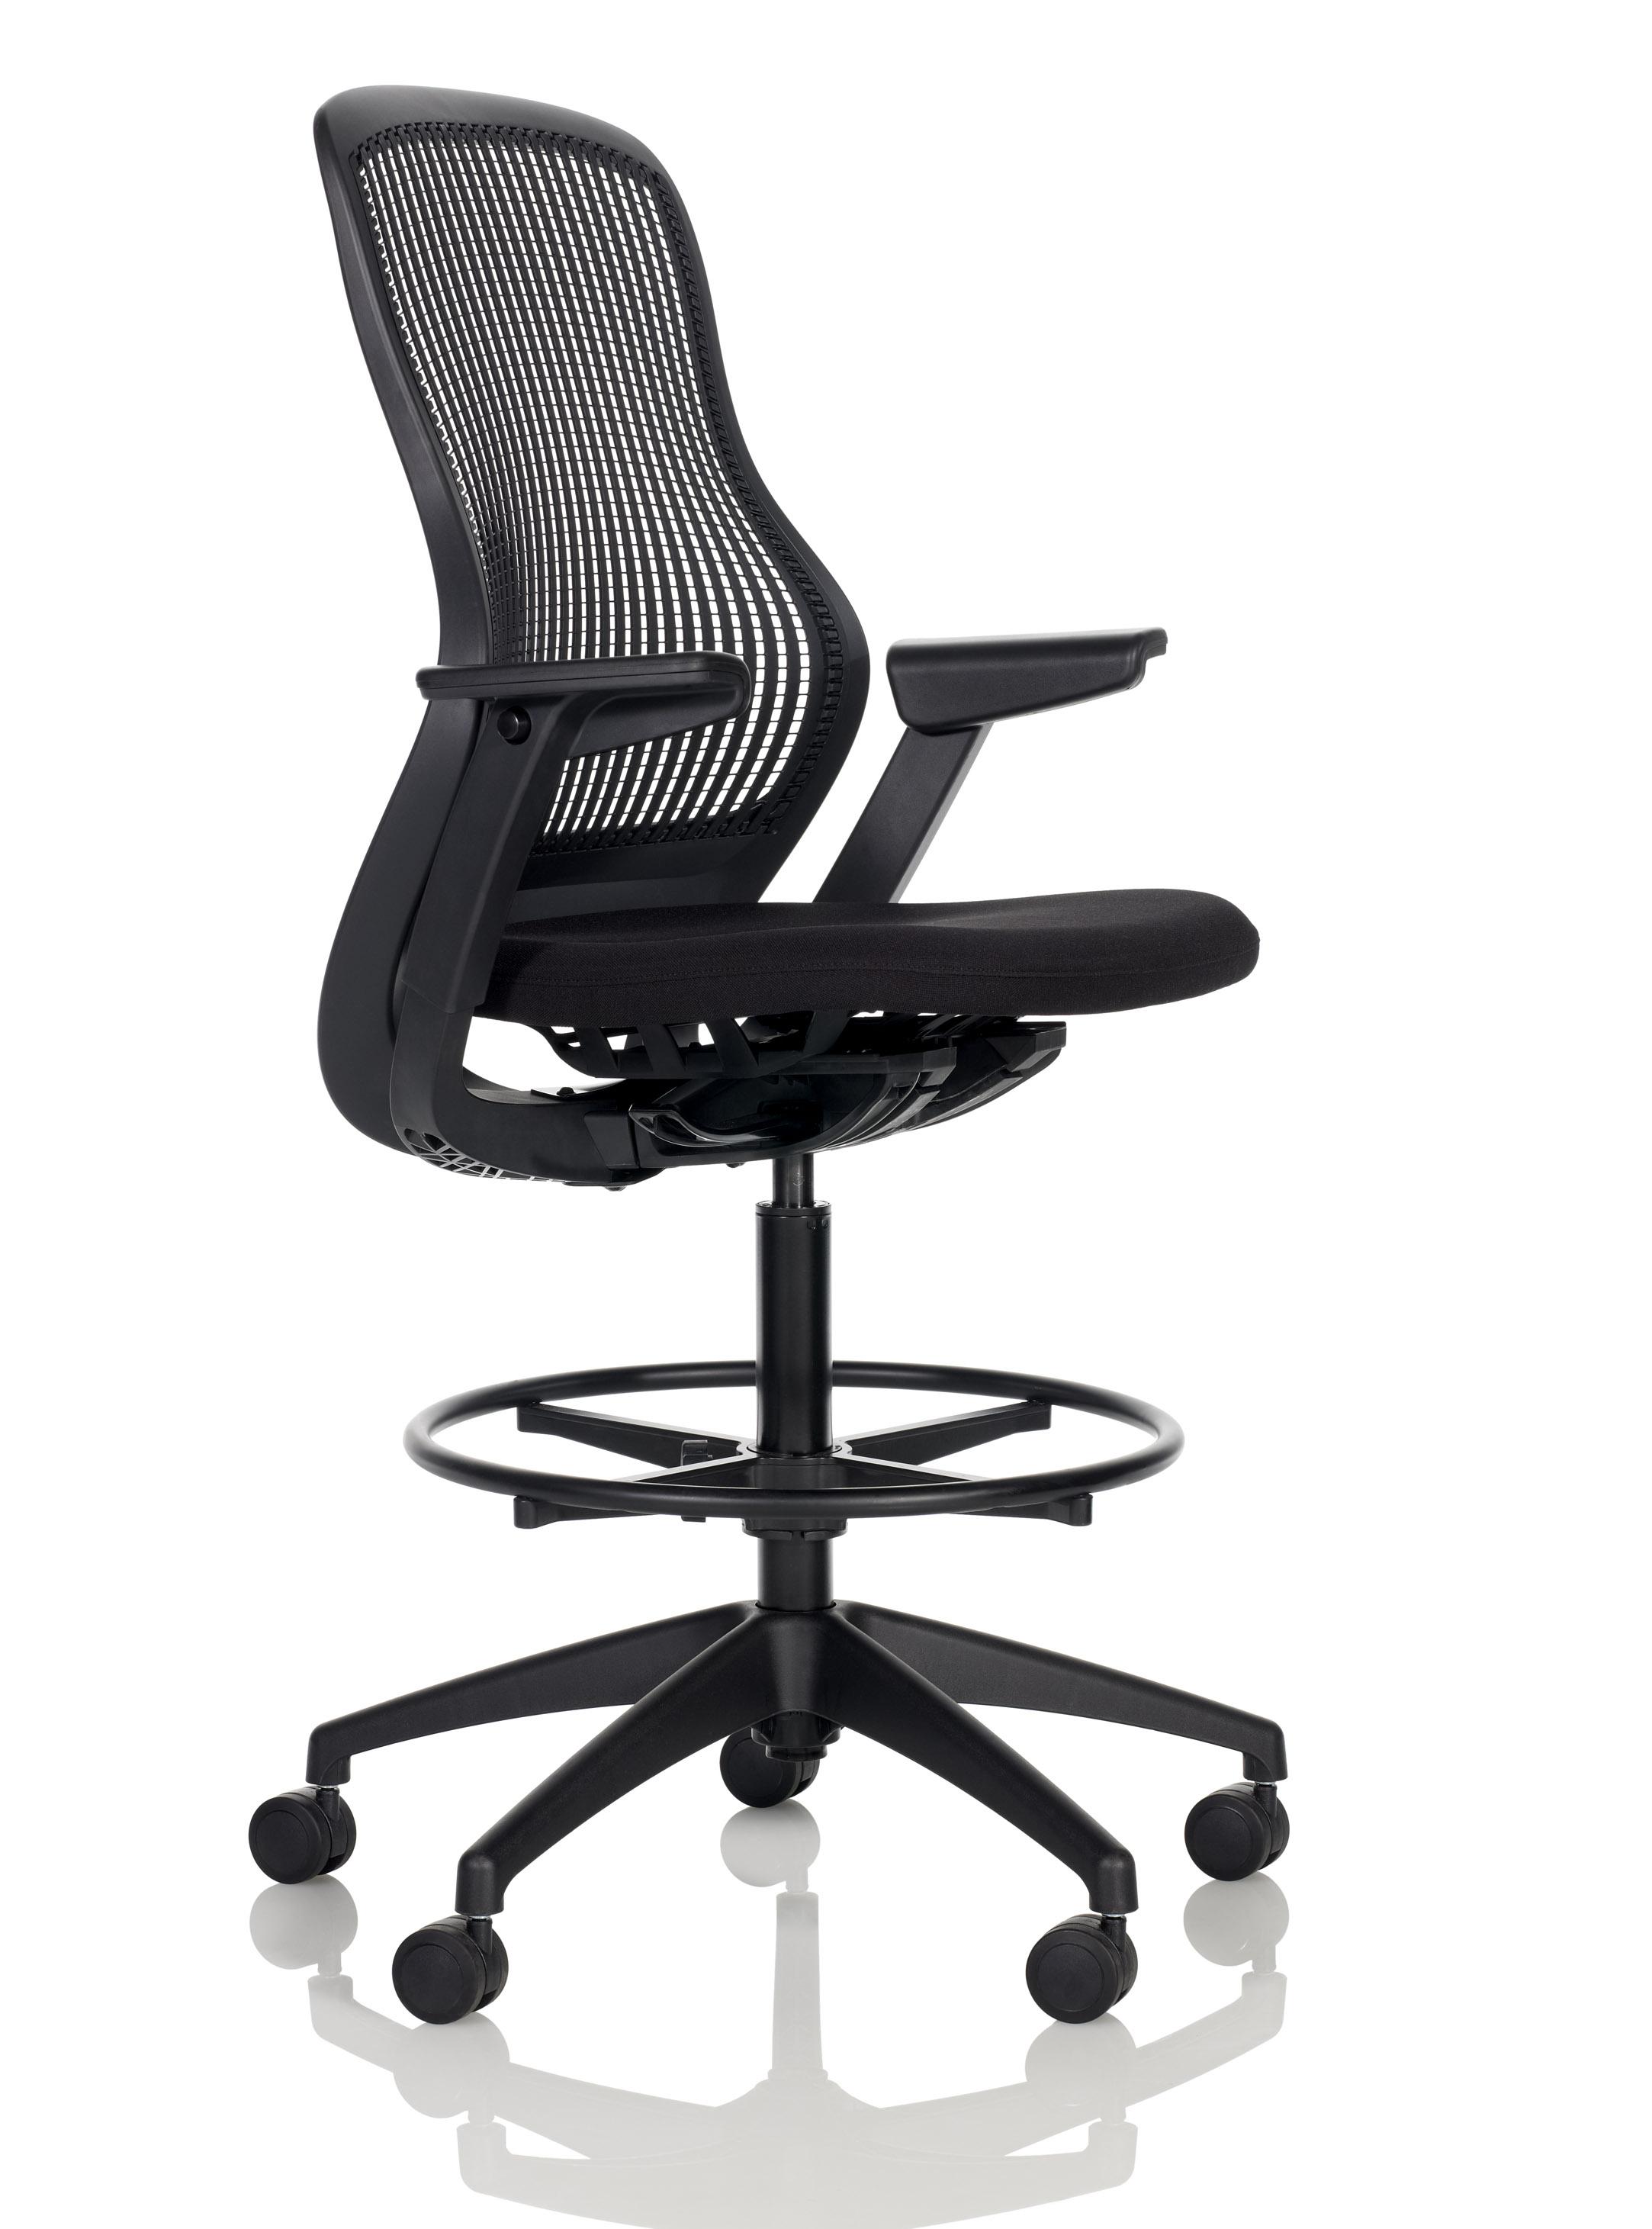 knoll generation task chair electric recliner motors parts regeneration by ergonomic high